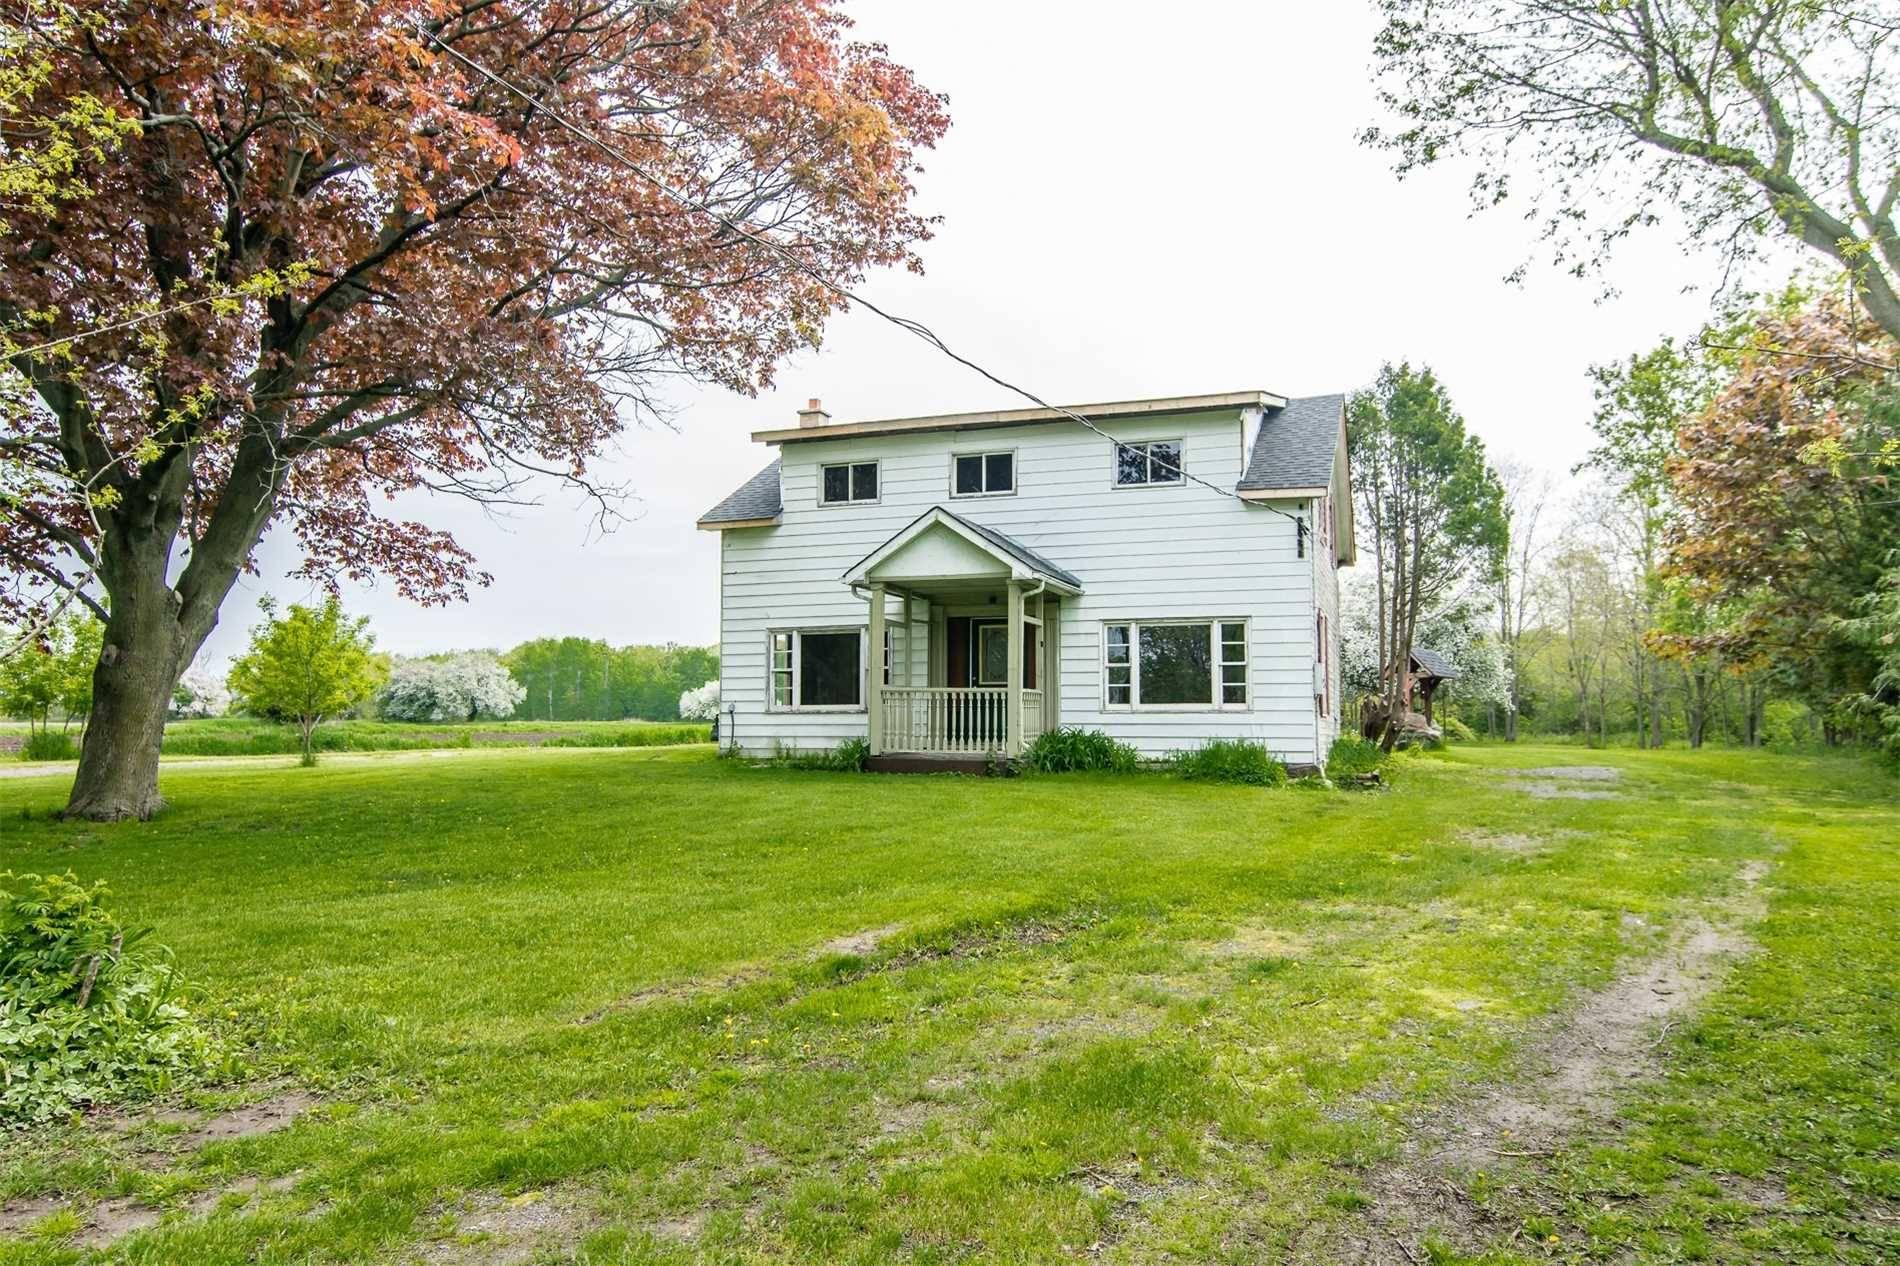 House for sale at 1413 Stephenson Rd Clarington Ontario - MLS: E4425759